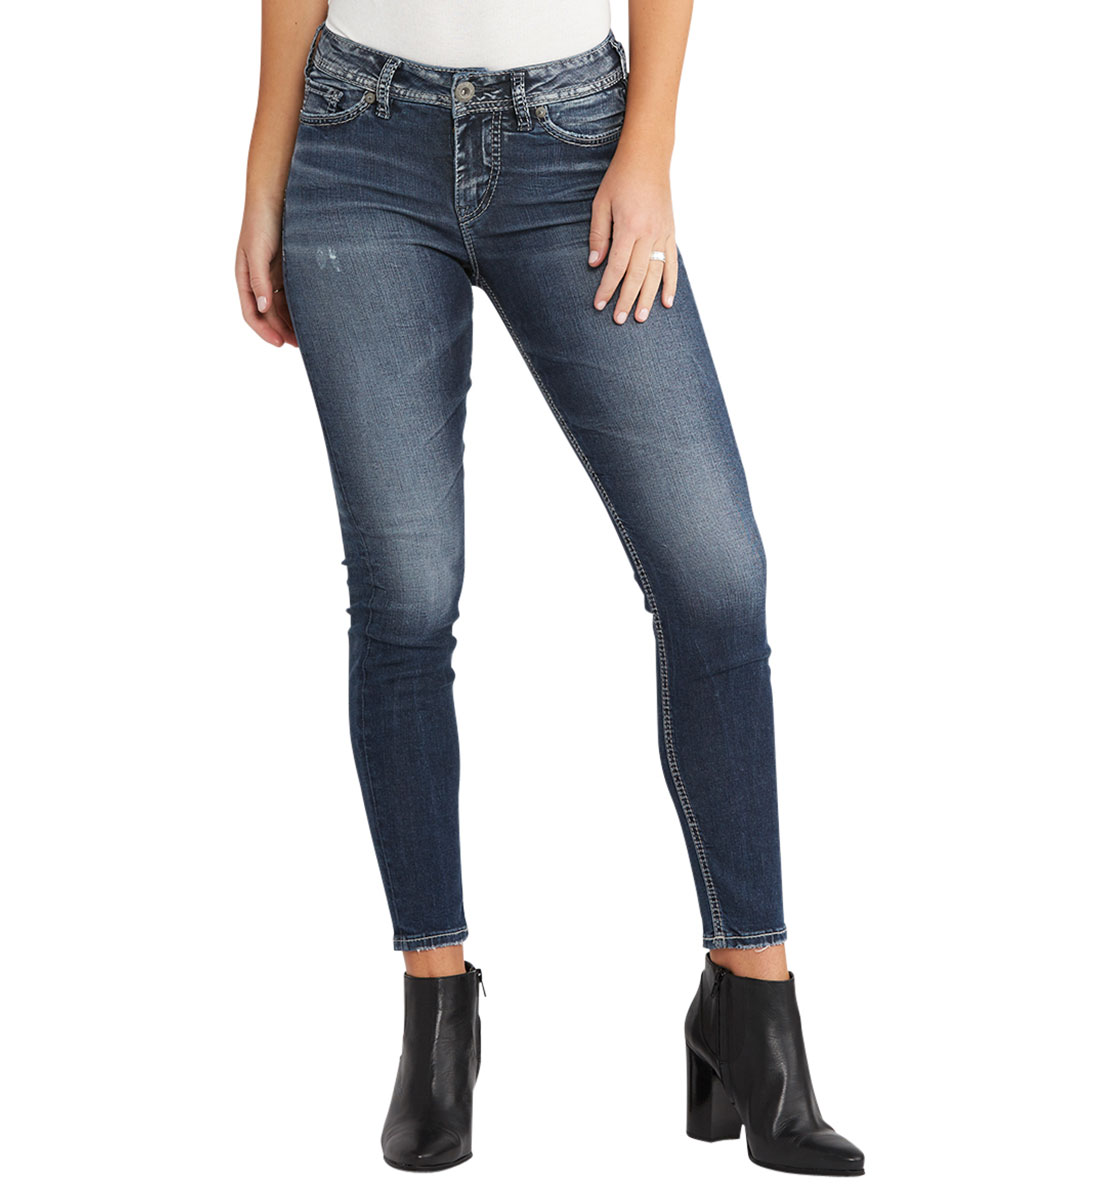 089ec111 Mazy Ankle Skinny Dark Wash | Silver Jeans